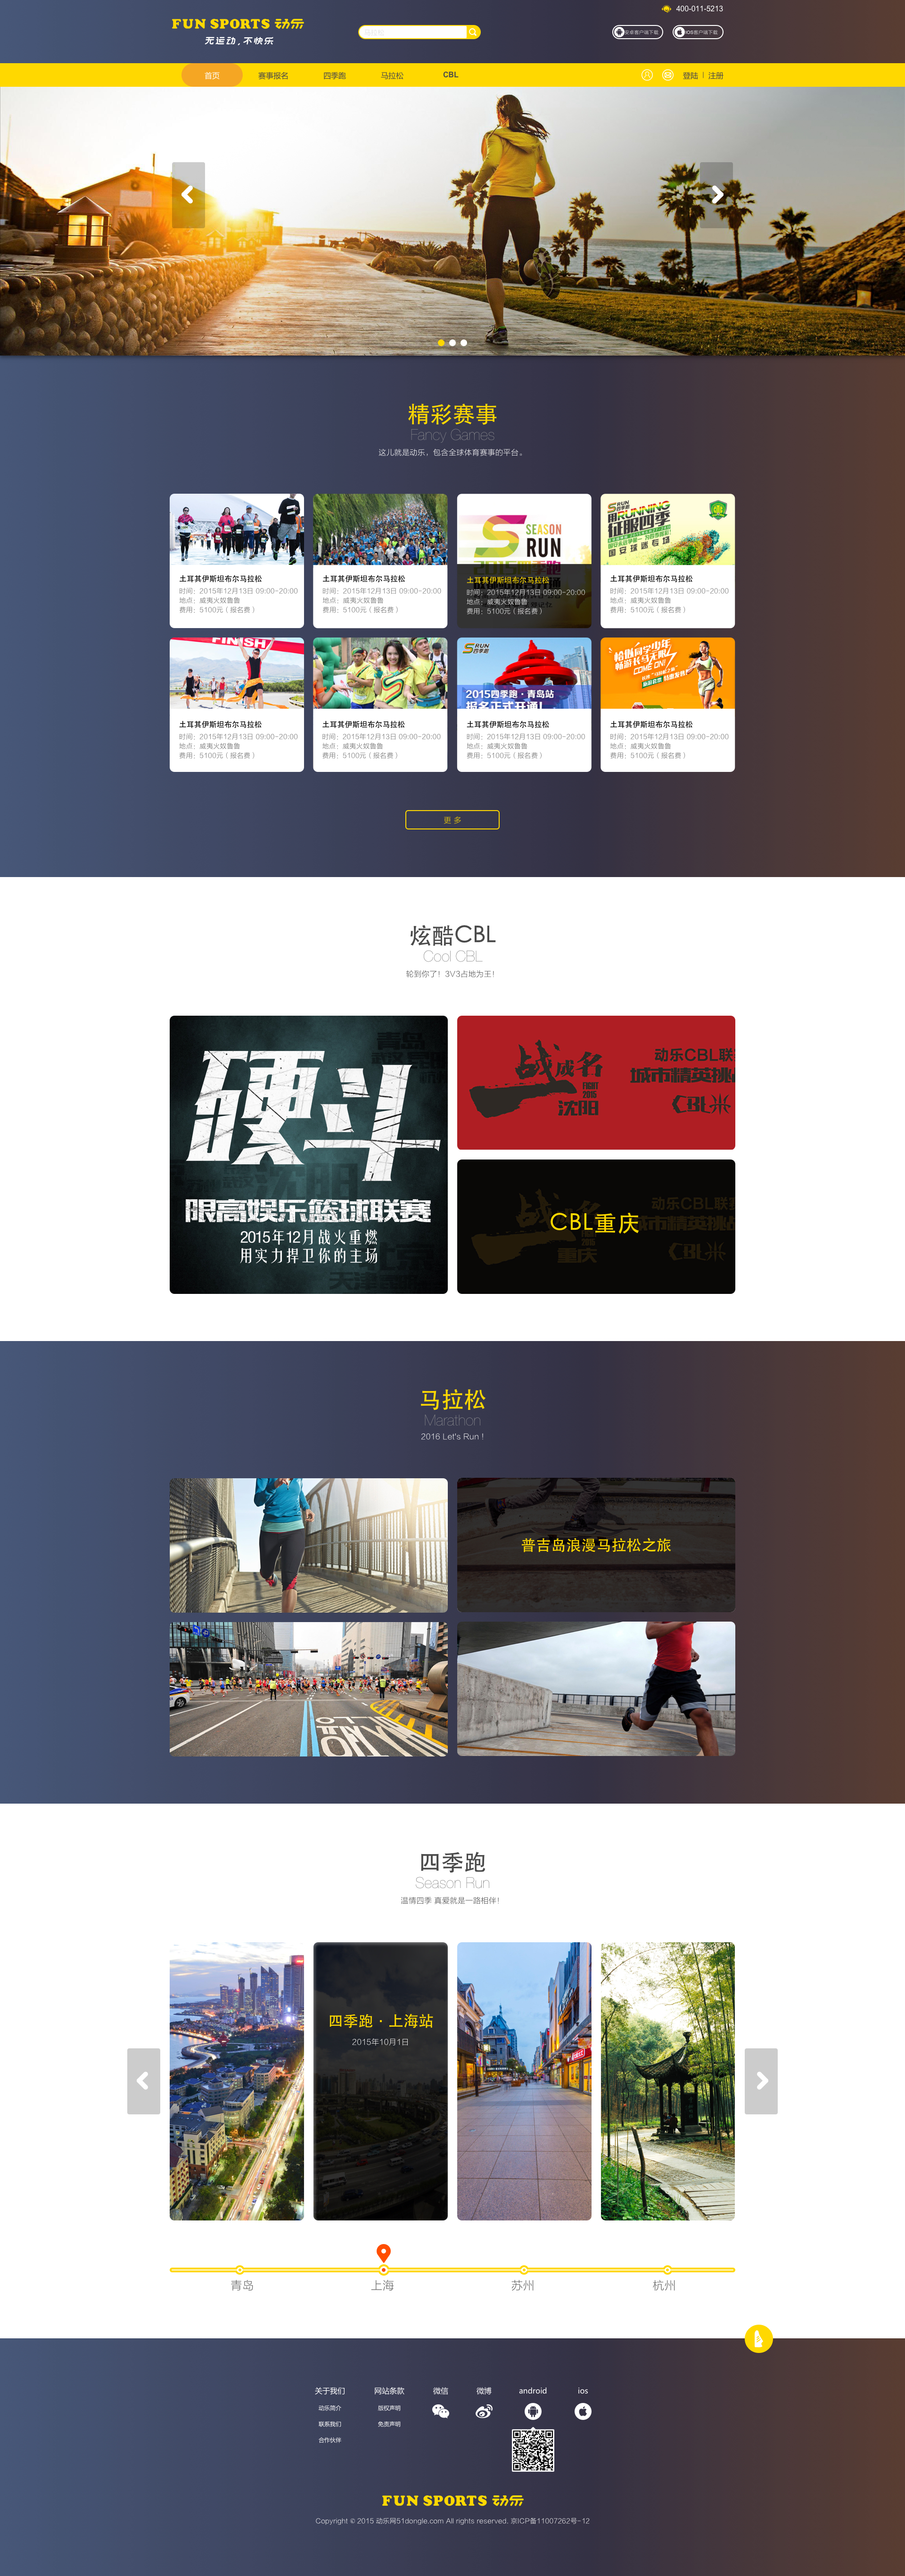 Dongle homepage.jpg